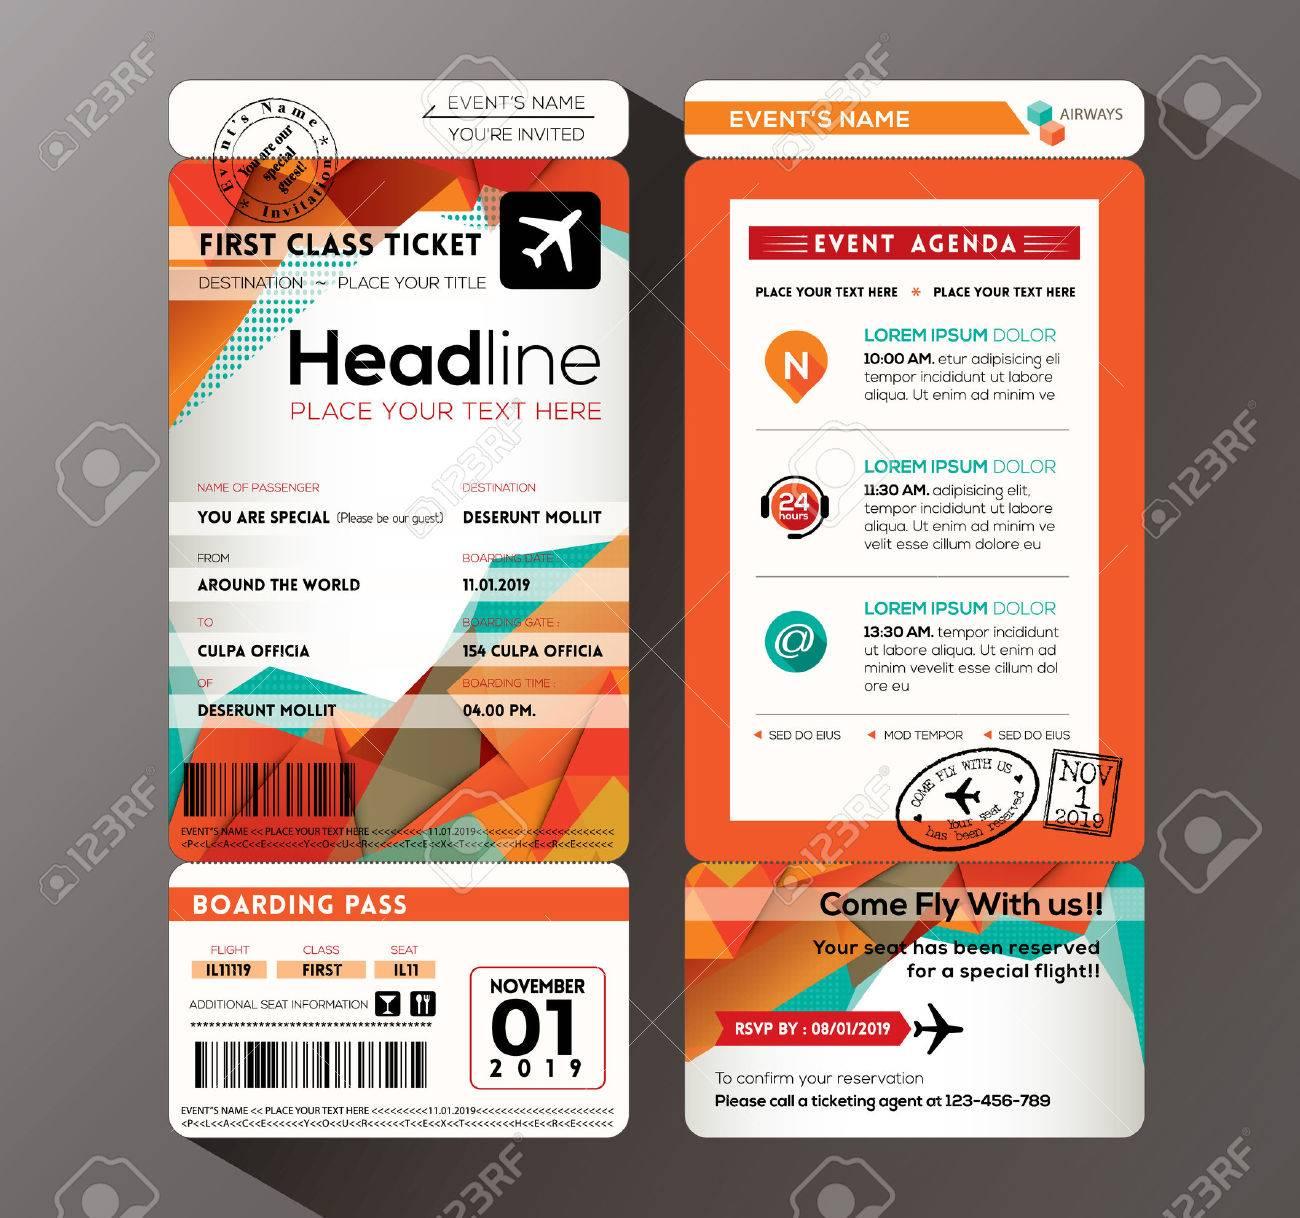 Modern Design Boarding Pass Ticket Event Invitation Card Vector – Ticket Size Template